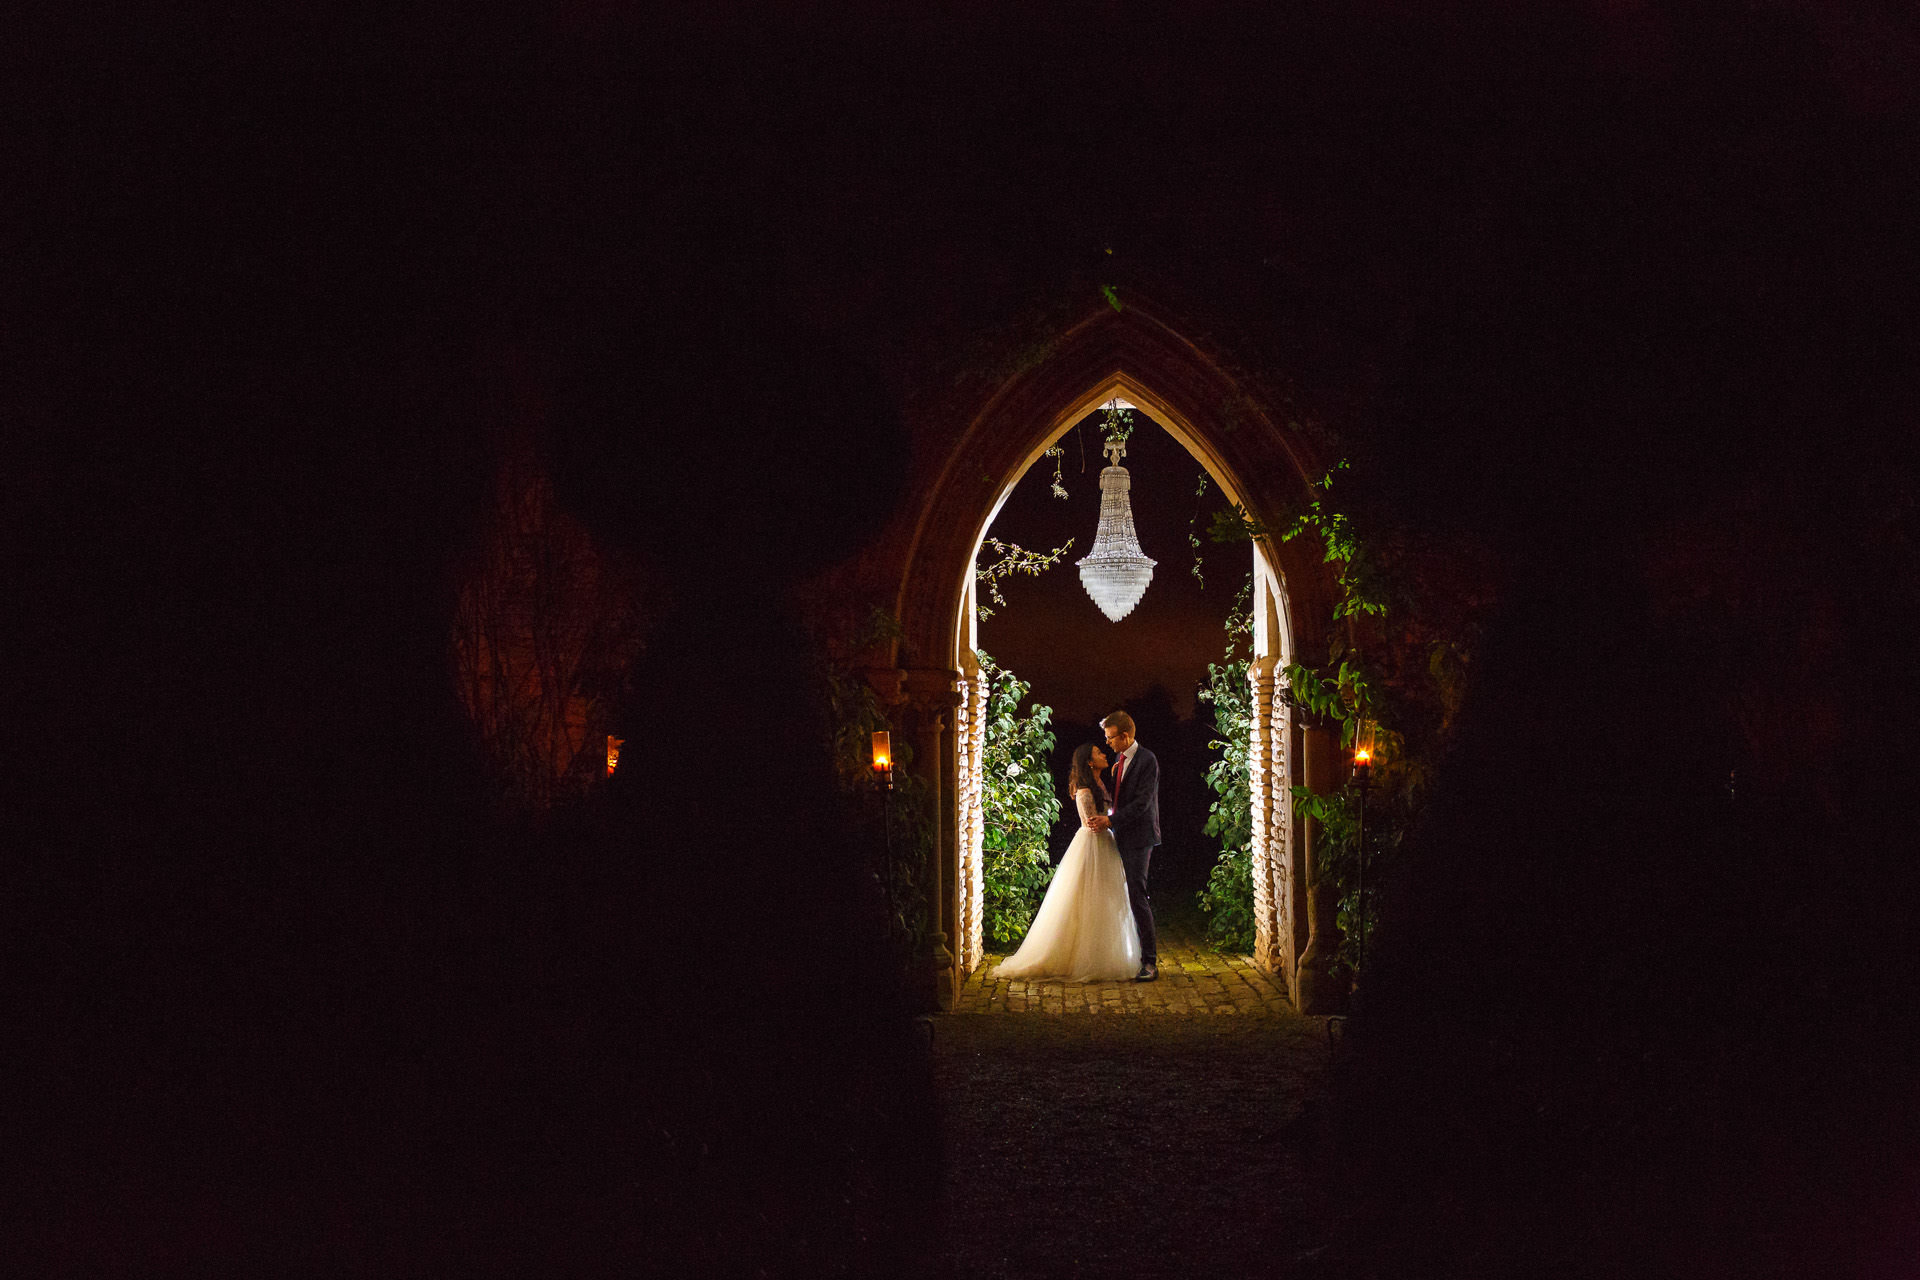 Chinese wedding photographer Portfolio couple under the arch